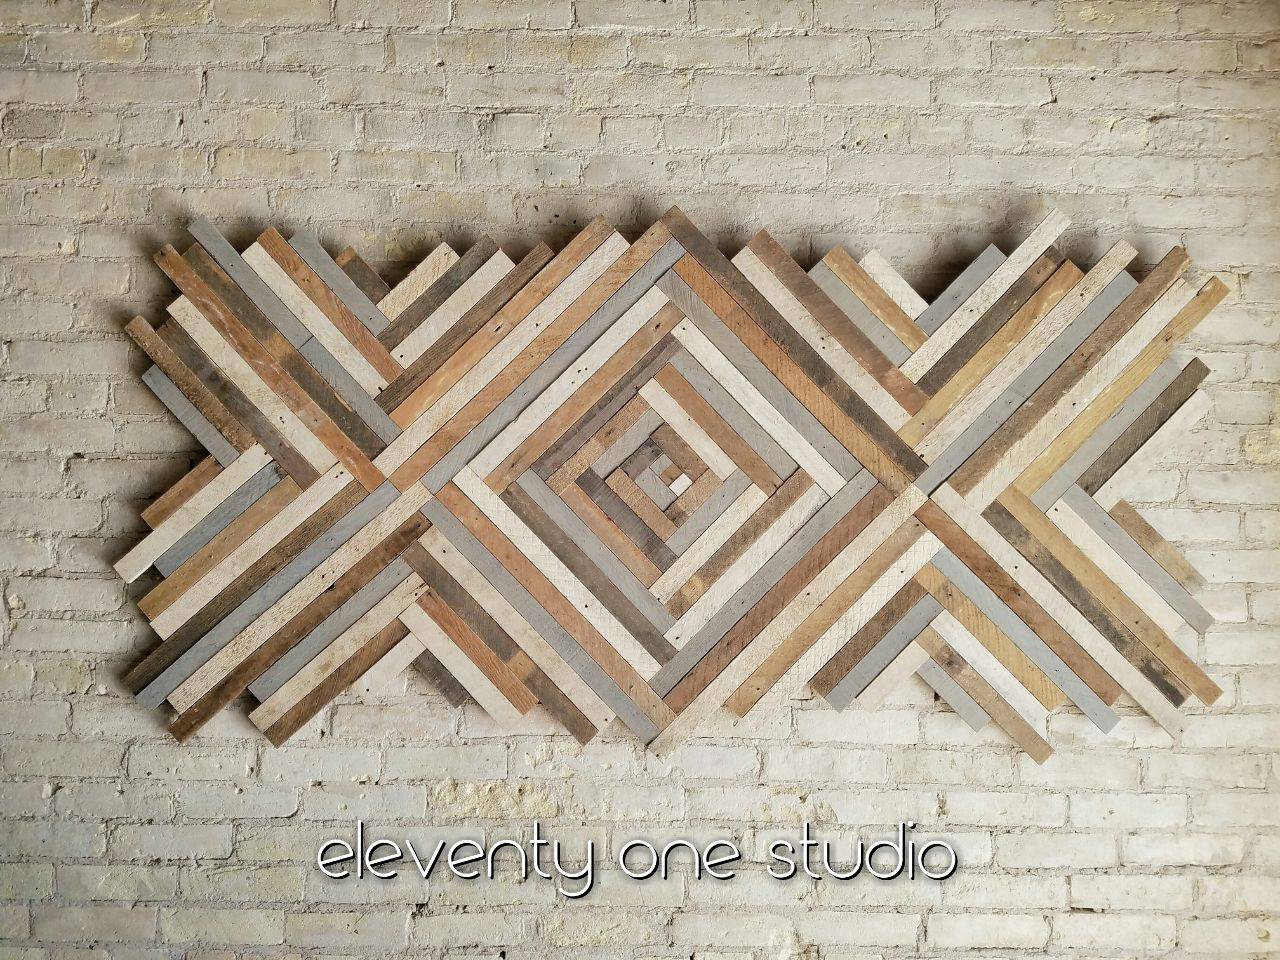 Reclaimed Wood Wall Art Reclaimed Wood Wall Art Reclaimed Wood Art Staggered Reclaimed